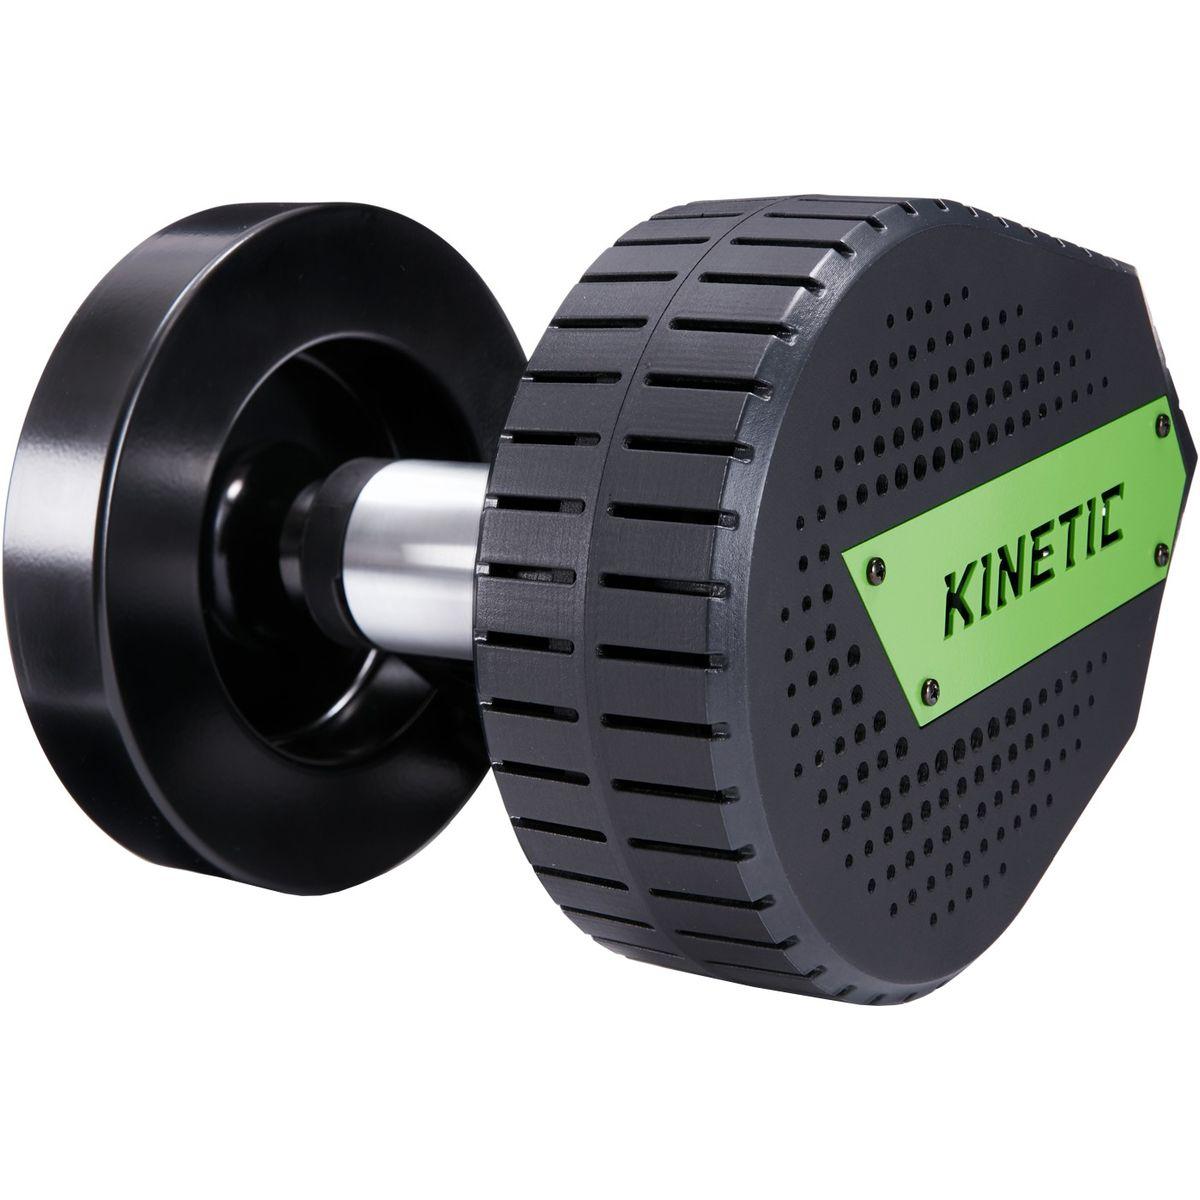 kinetic smart control power unit competitive cyclist kinetic smart control power unit